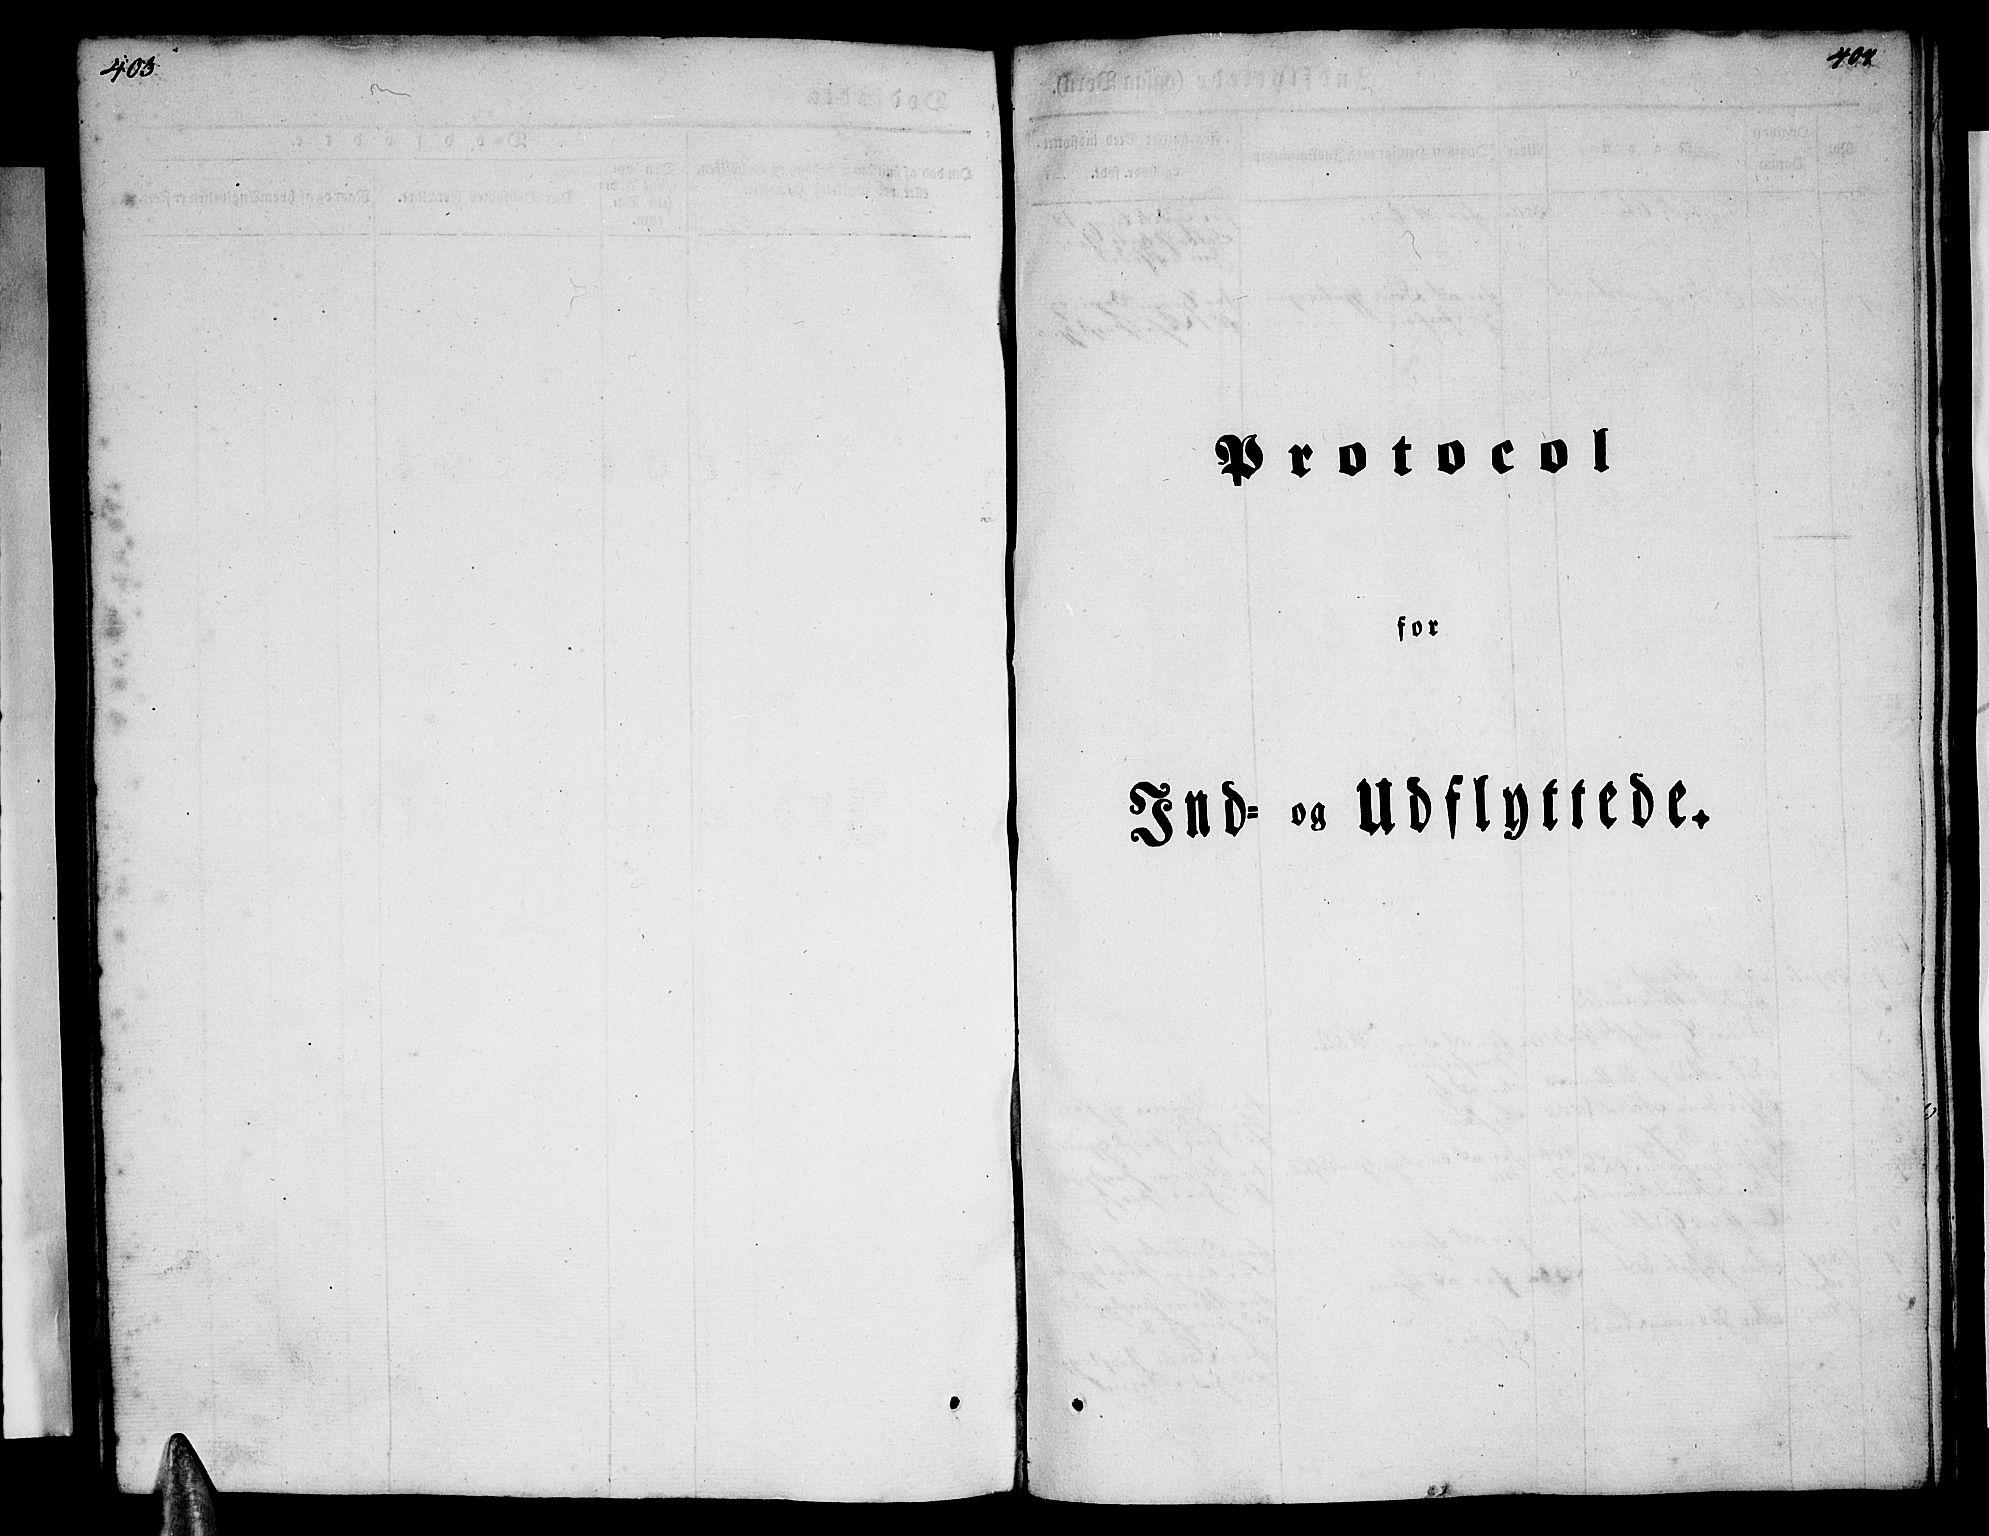 SAT, Ministerialprotokoller, klokkerbøker og fødselsregistre - Nordland, 827/L0413: Klokkerbok nr. 827C02, 1842-1852, s. 403-404